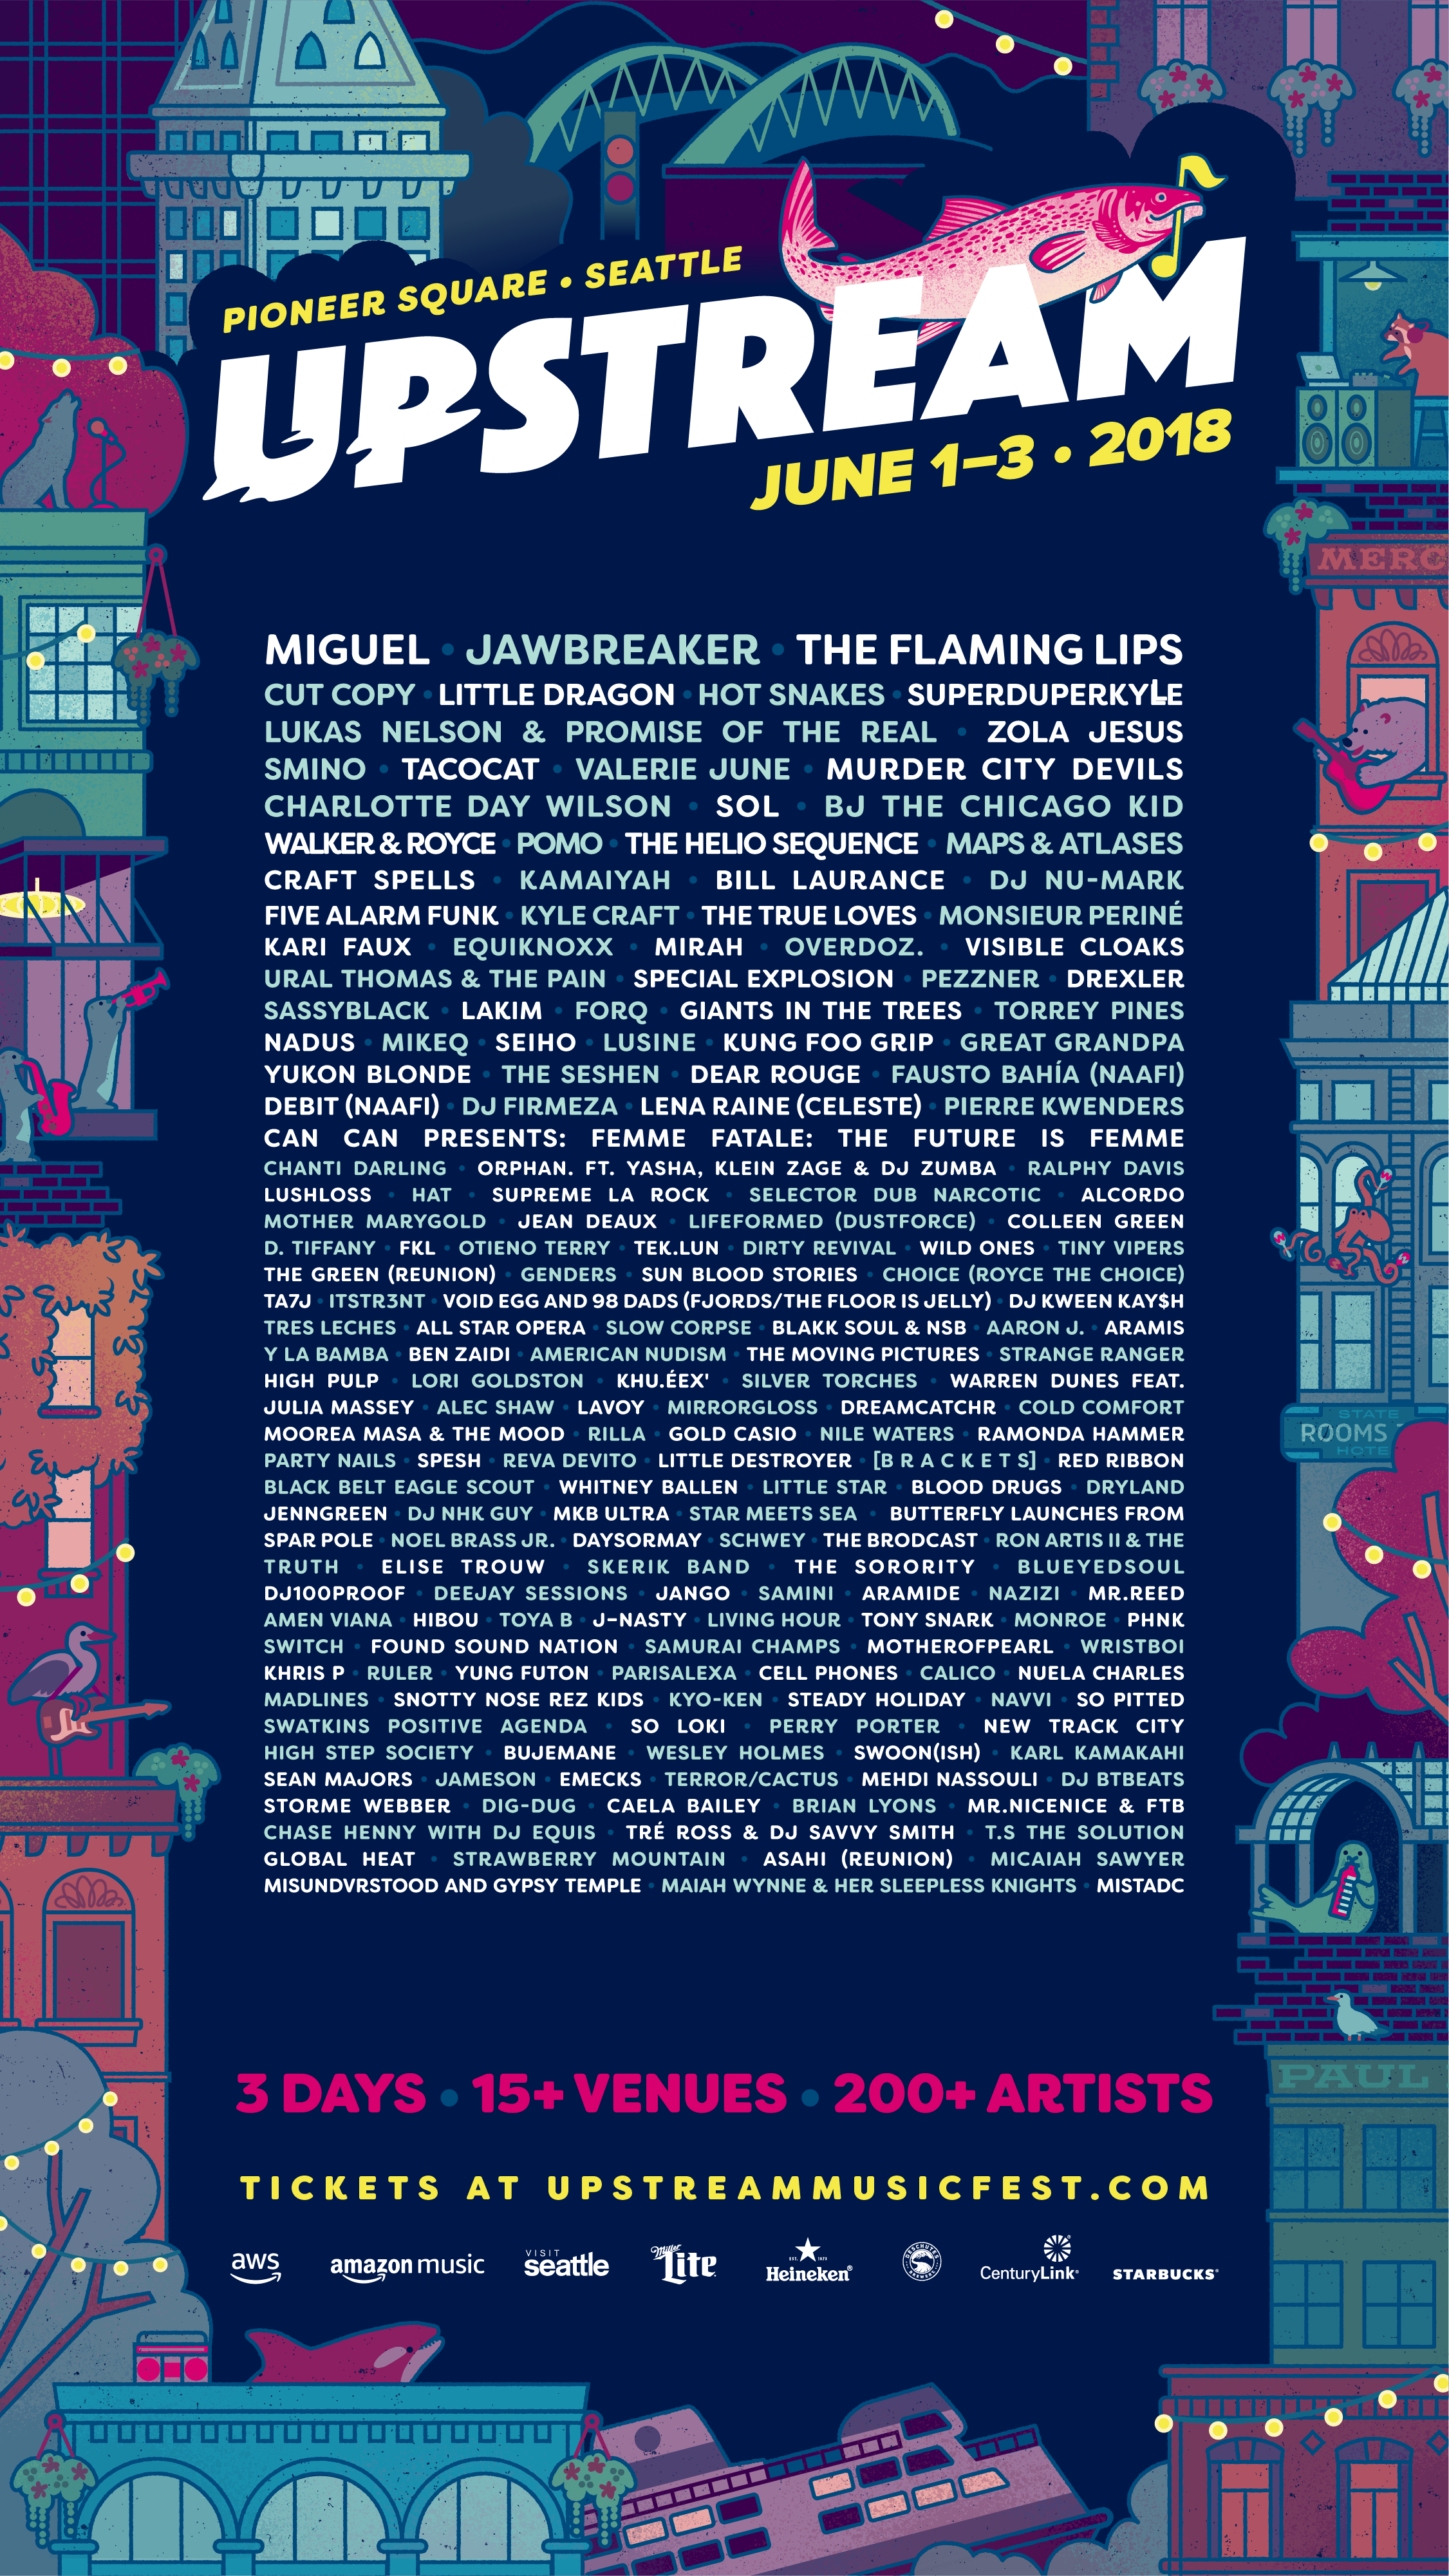 Upstream Fest (Seattle, WA) announces its full lineup